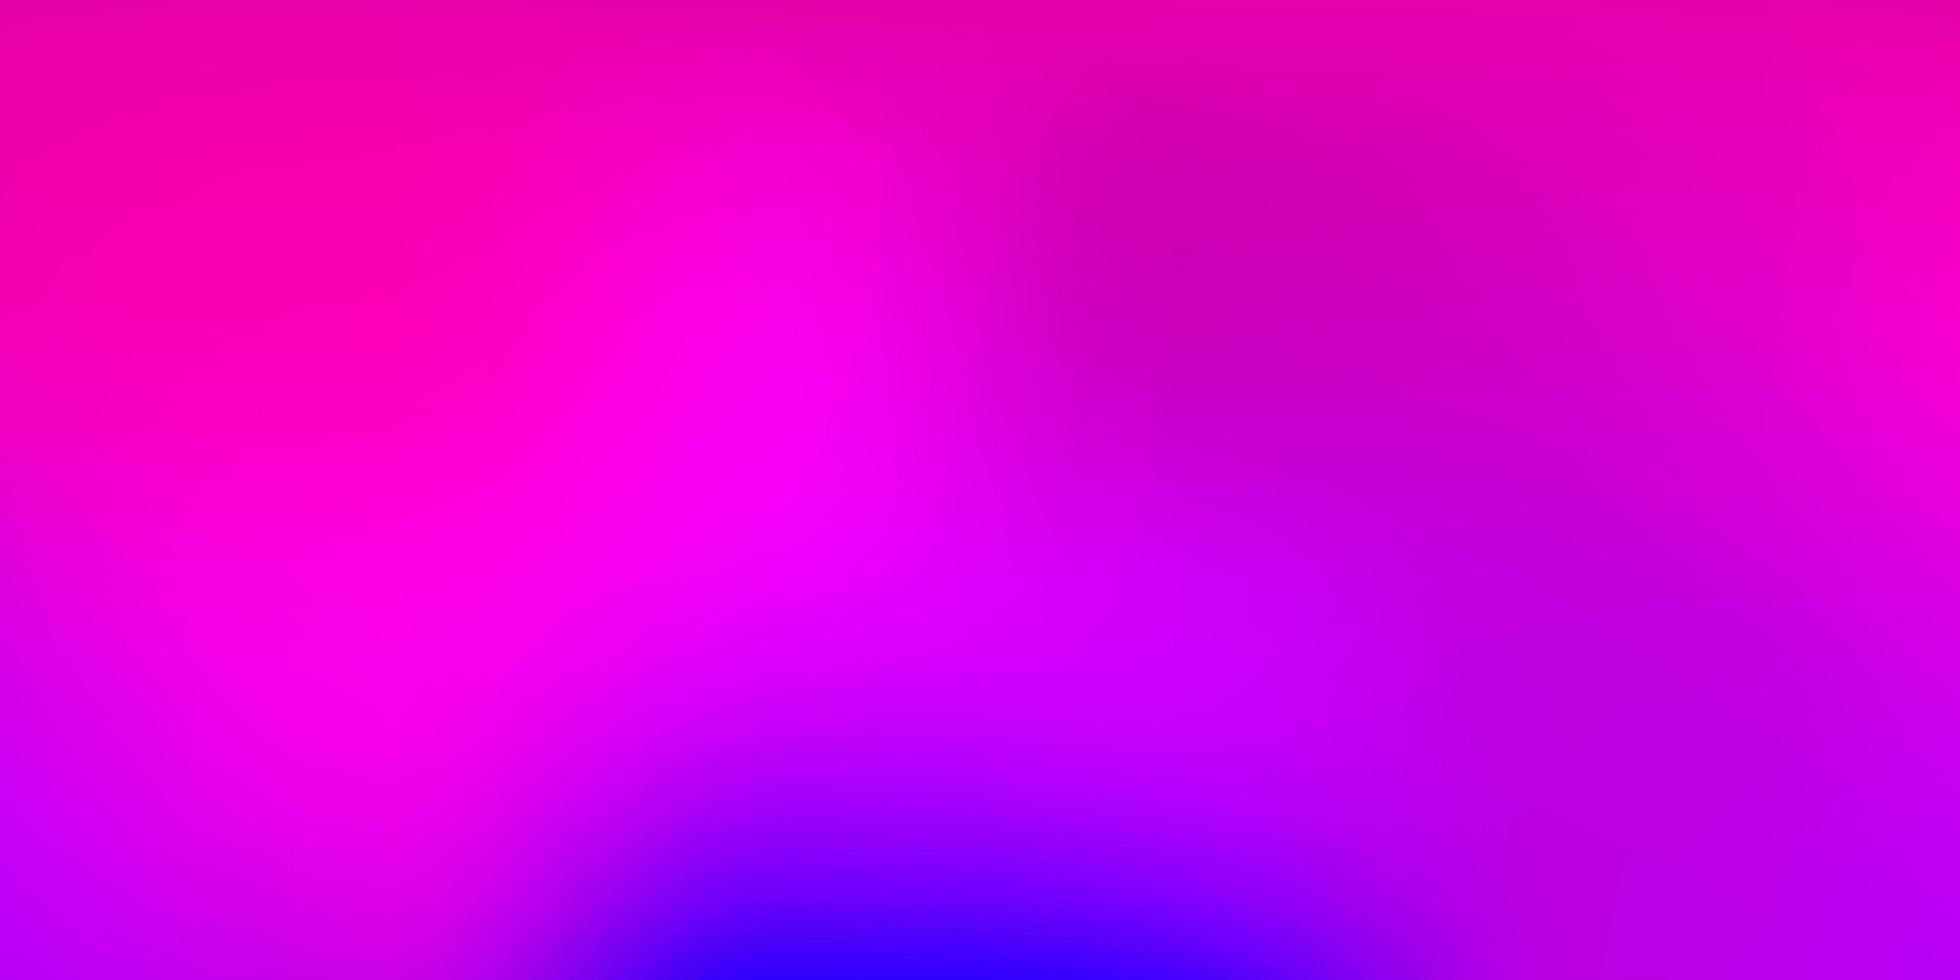 dibujo de desenfoque degradado vectorial rosa oscuro. vector